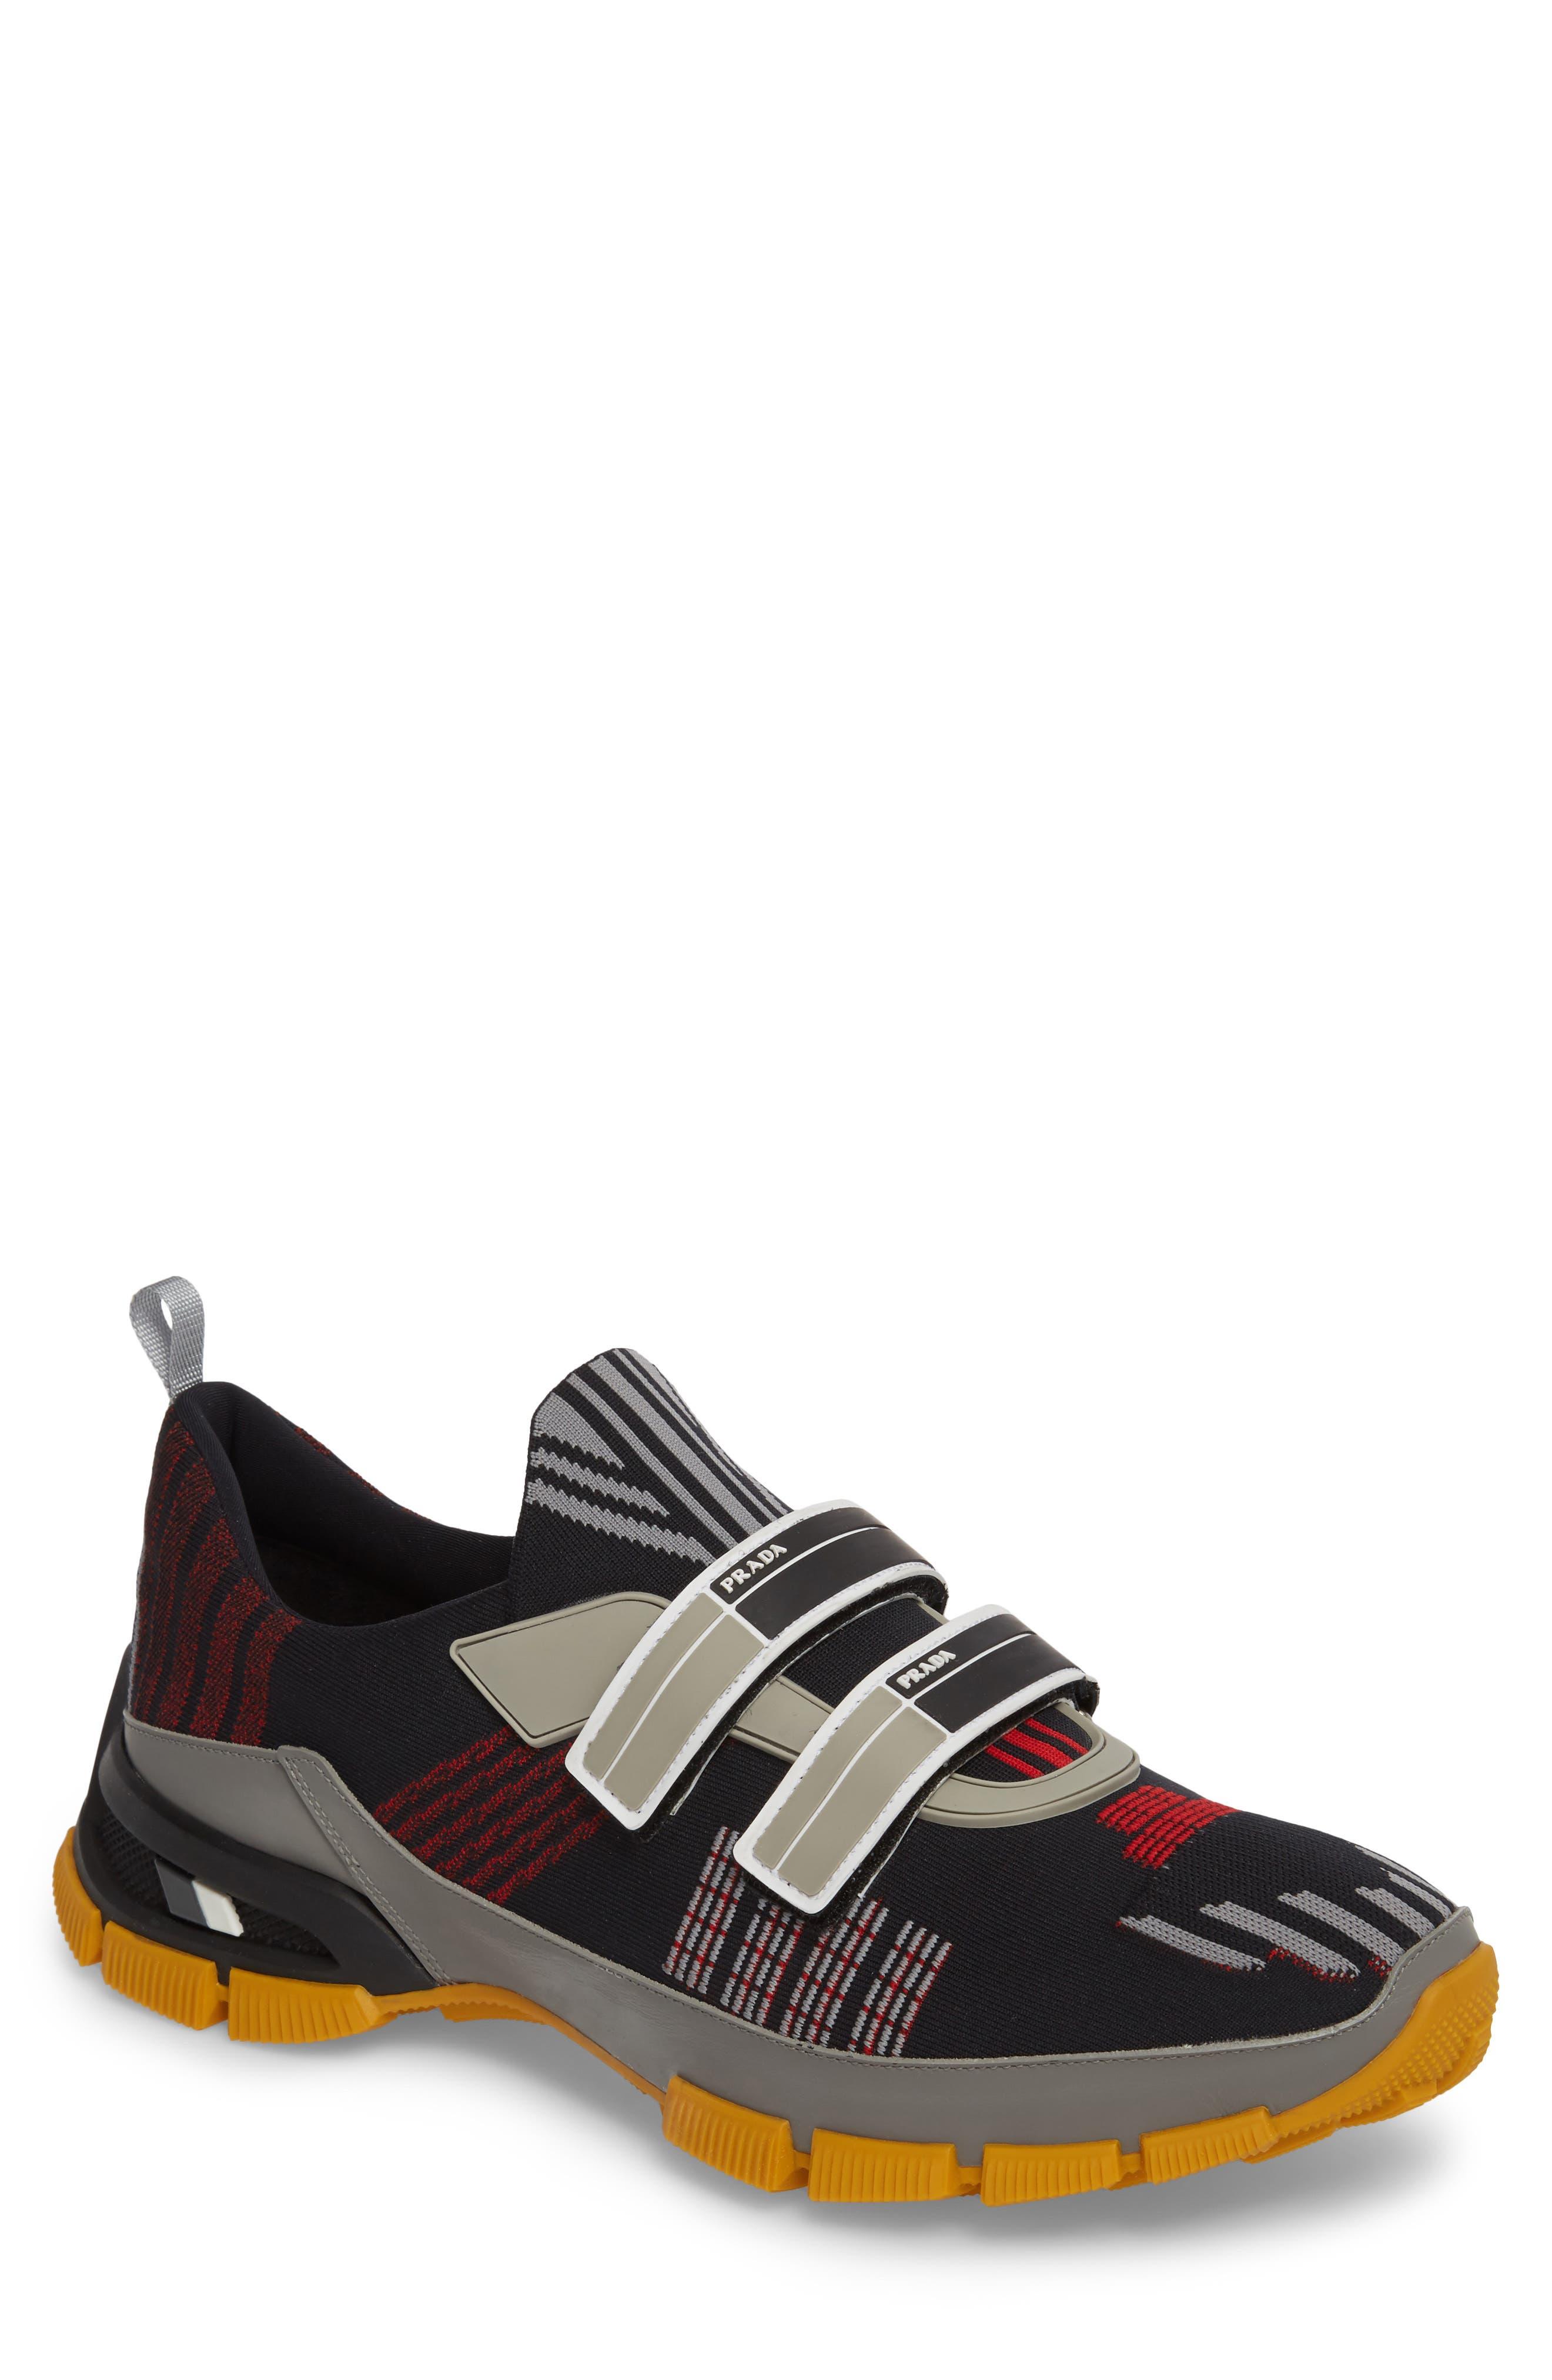 Alternate Image 1 Selected - Prada Linea Rossa Strap Sneaker (Men)